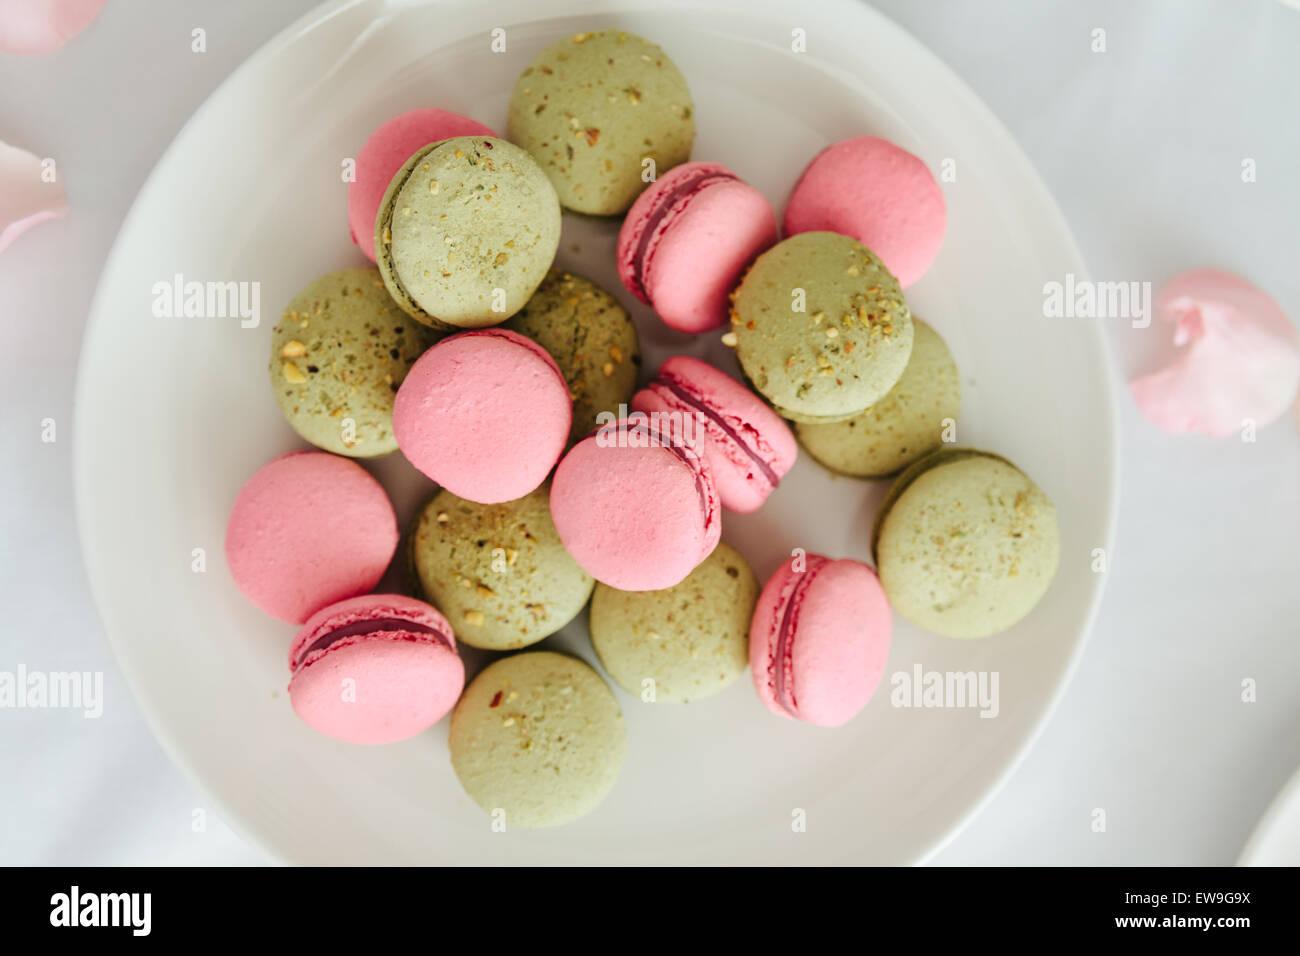 Fresh macarons on white plate - Stock Image